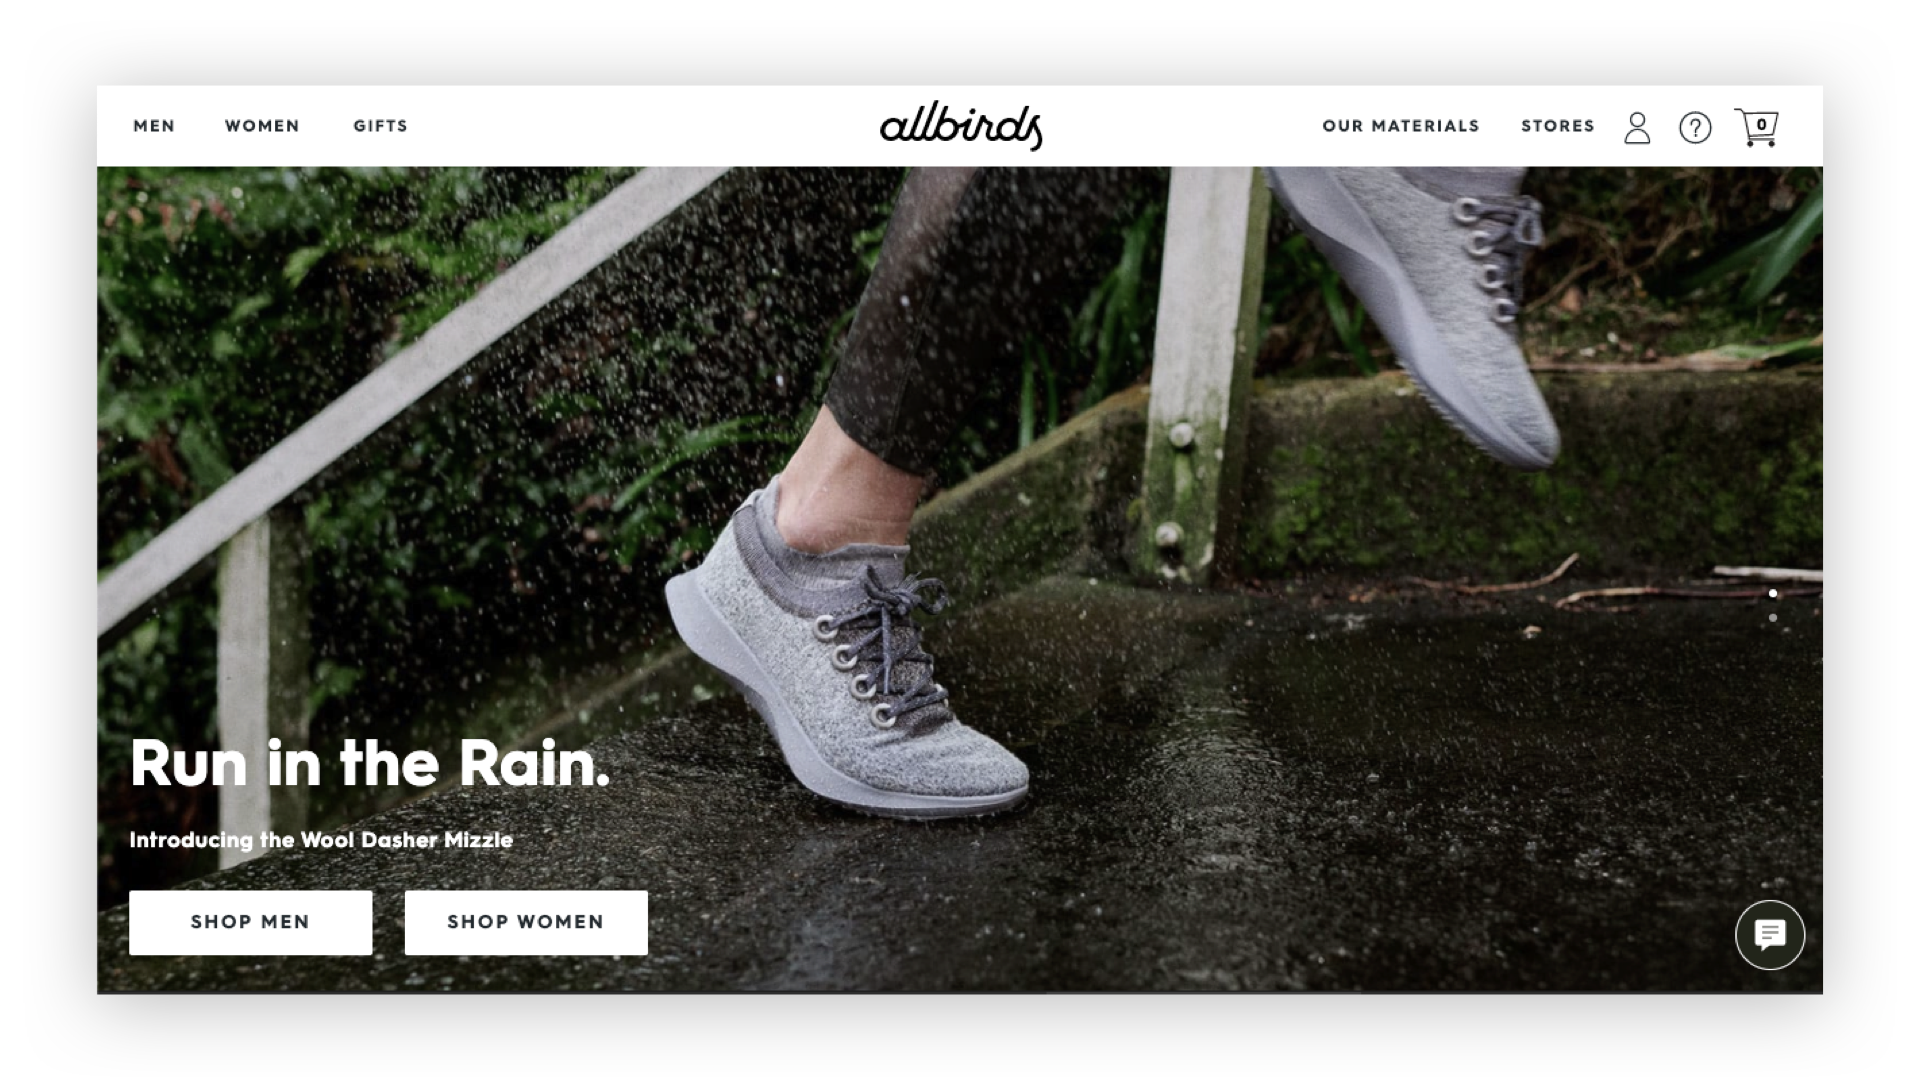 Digital agency on DTC strategy: Allbird's eCommerce site homepage